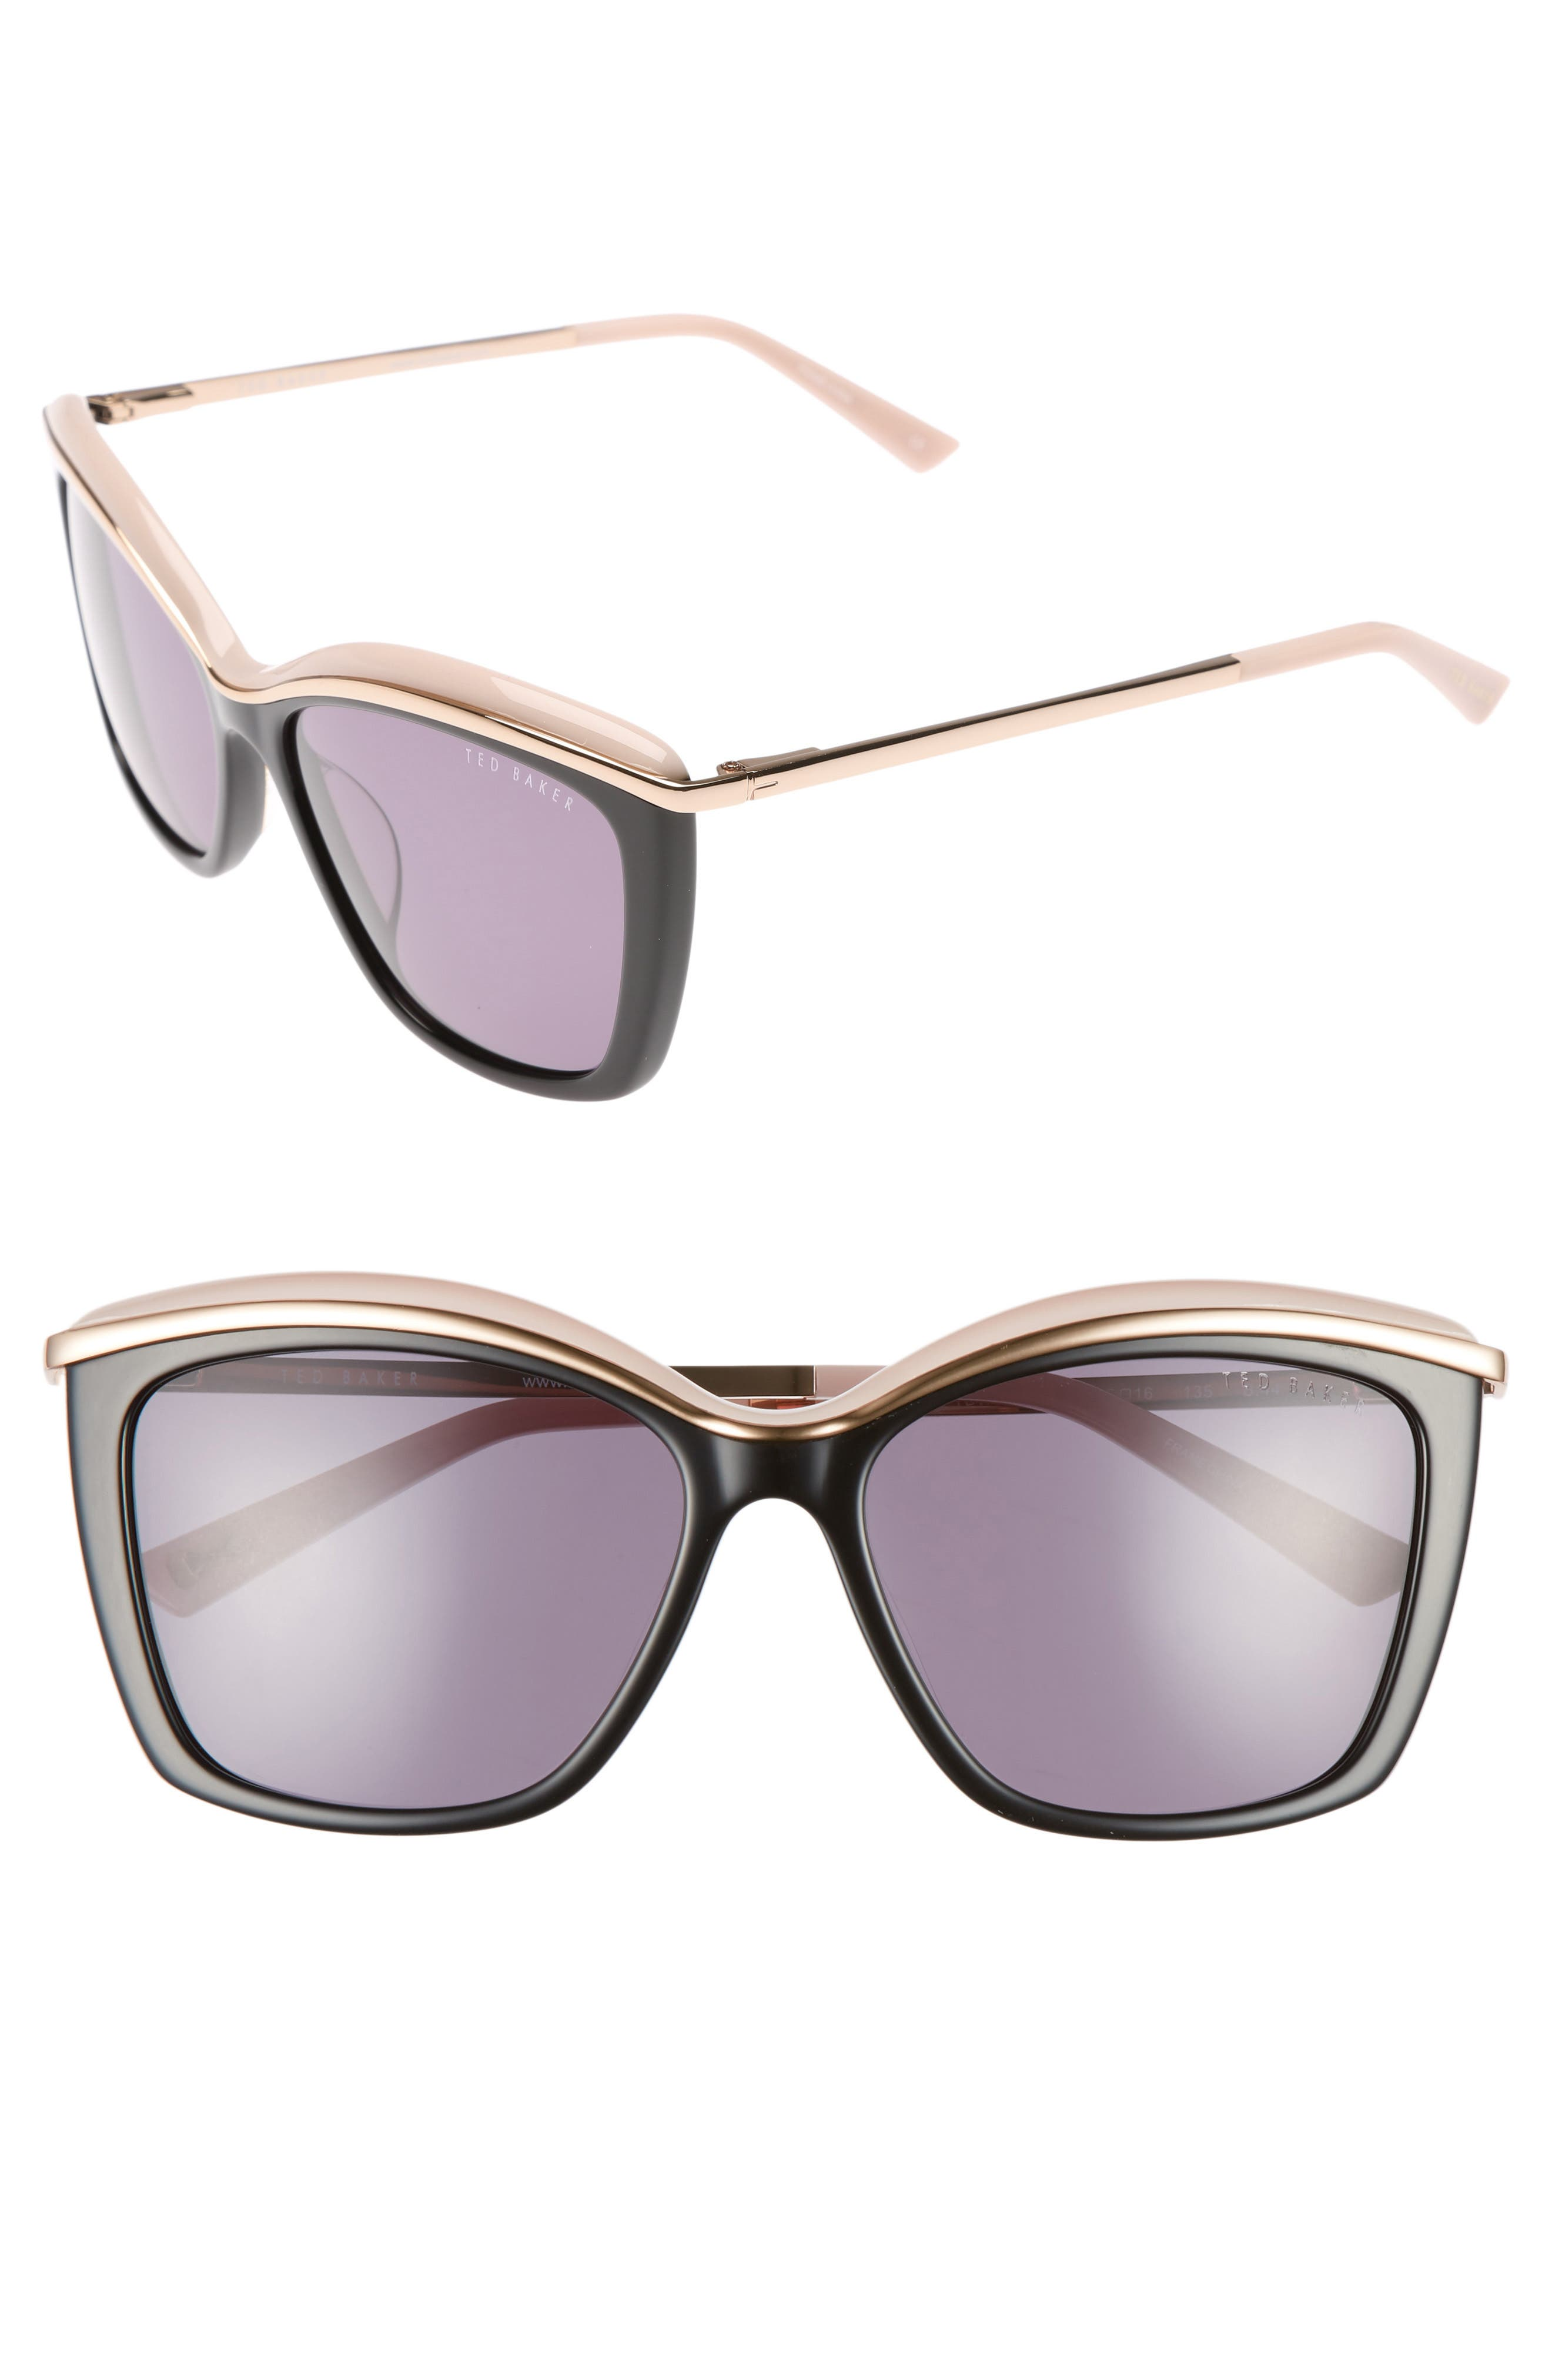 55mm Cat Eye Sunglasses,                             Main thumbnail 1, color,                             001